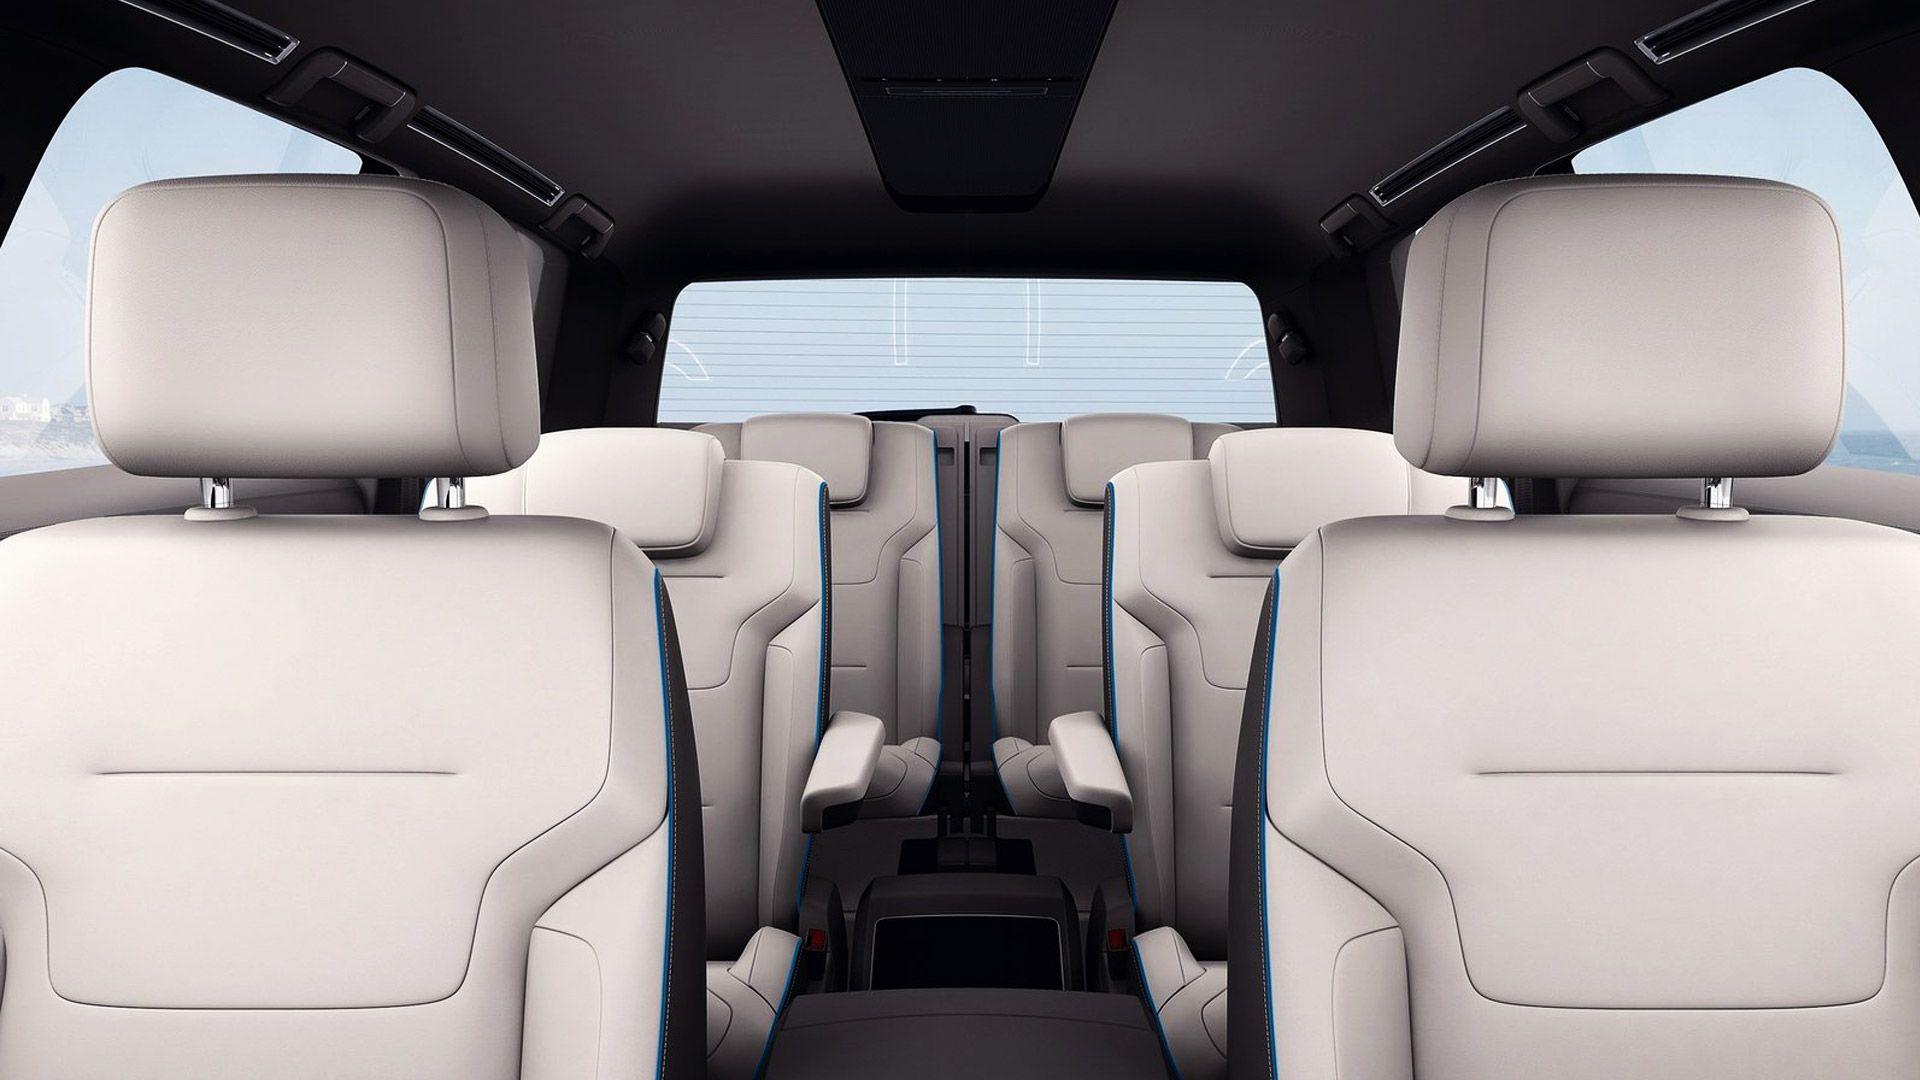 2013 Volkswagen Cross Blue SUV Concept Seat design Suv